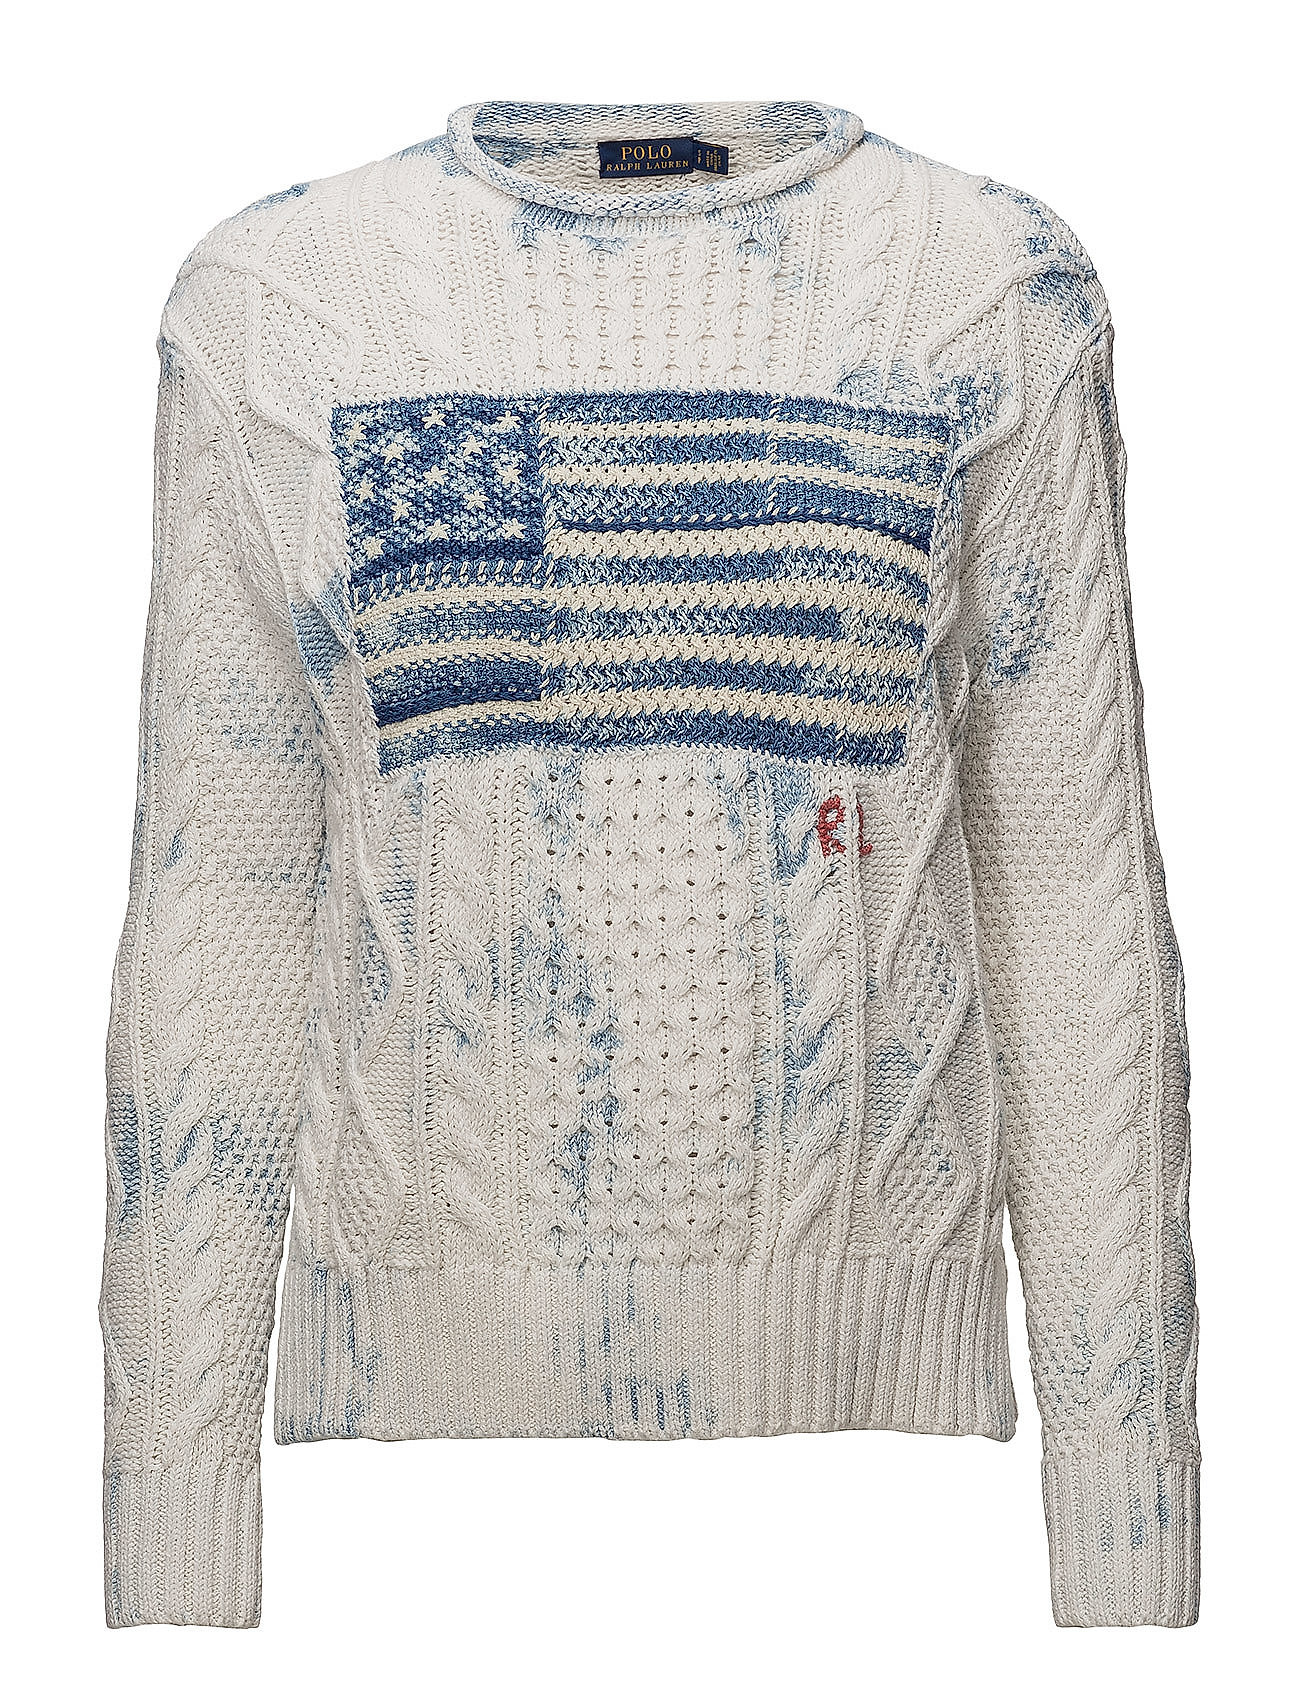 7cb2603dd ... switzerland polo ralph lauren indigo flag cotton sweater e71c7 baa67